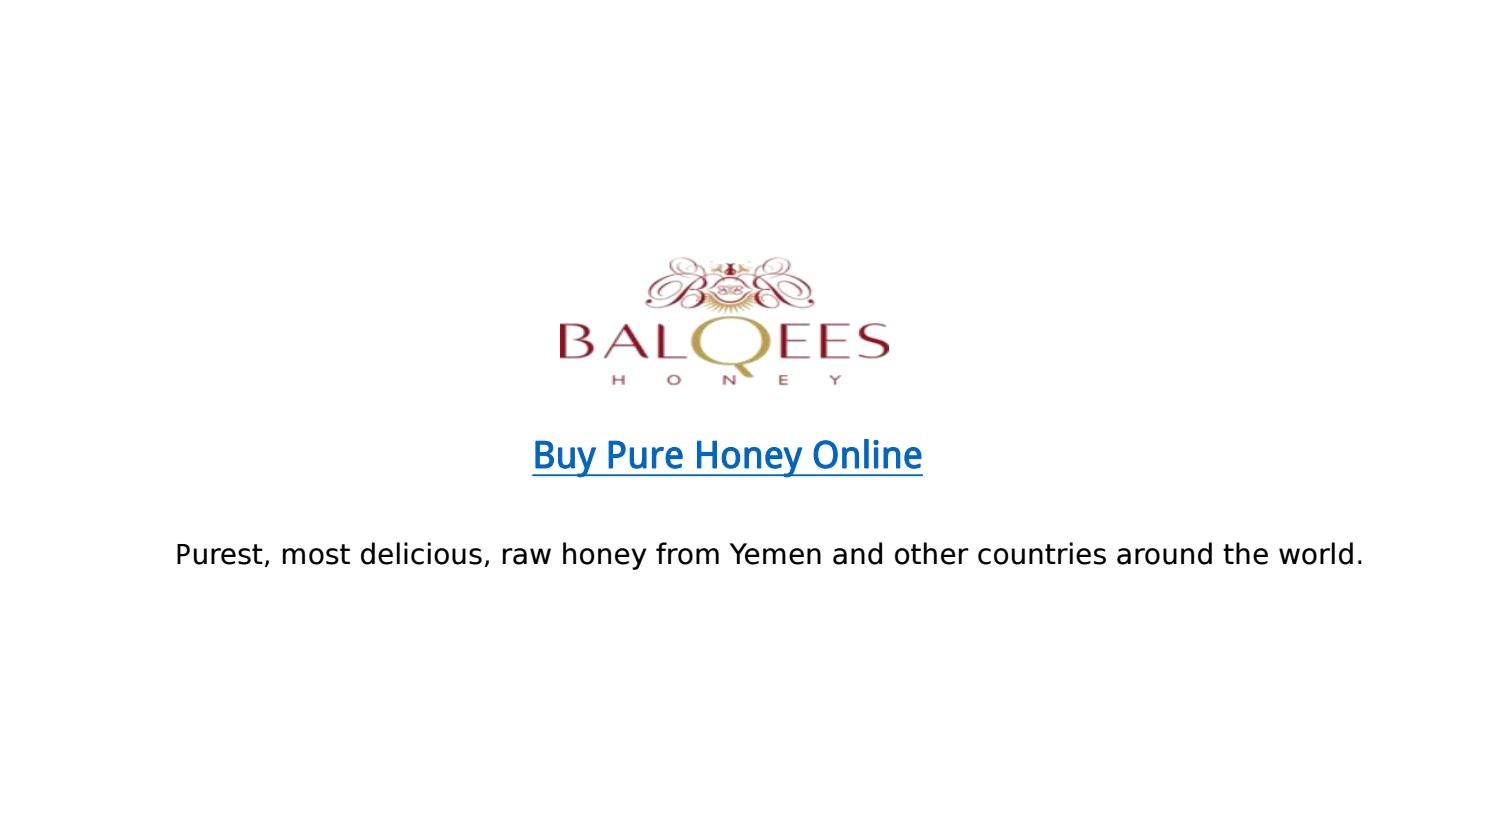 Buy Honey Online | Balqees Honey by ndznandu - issuu